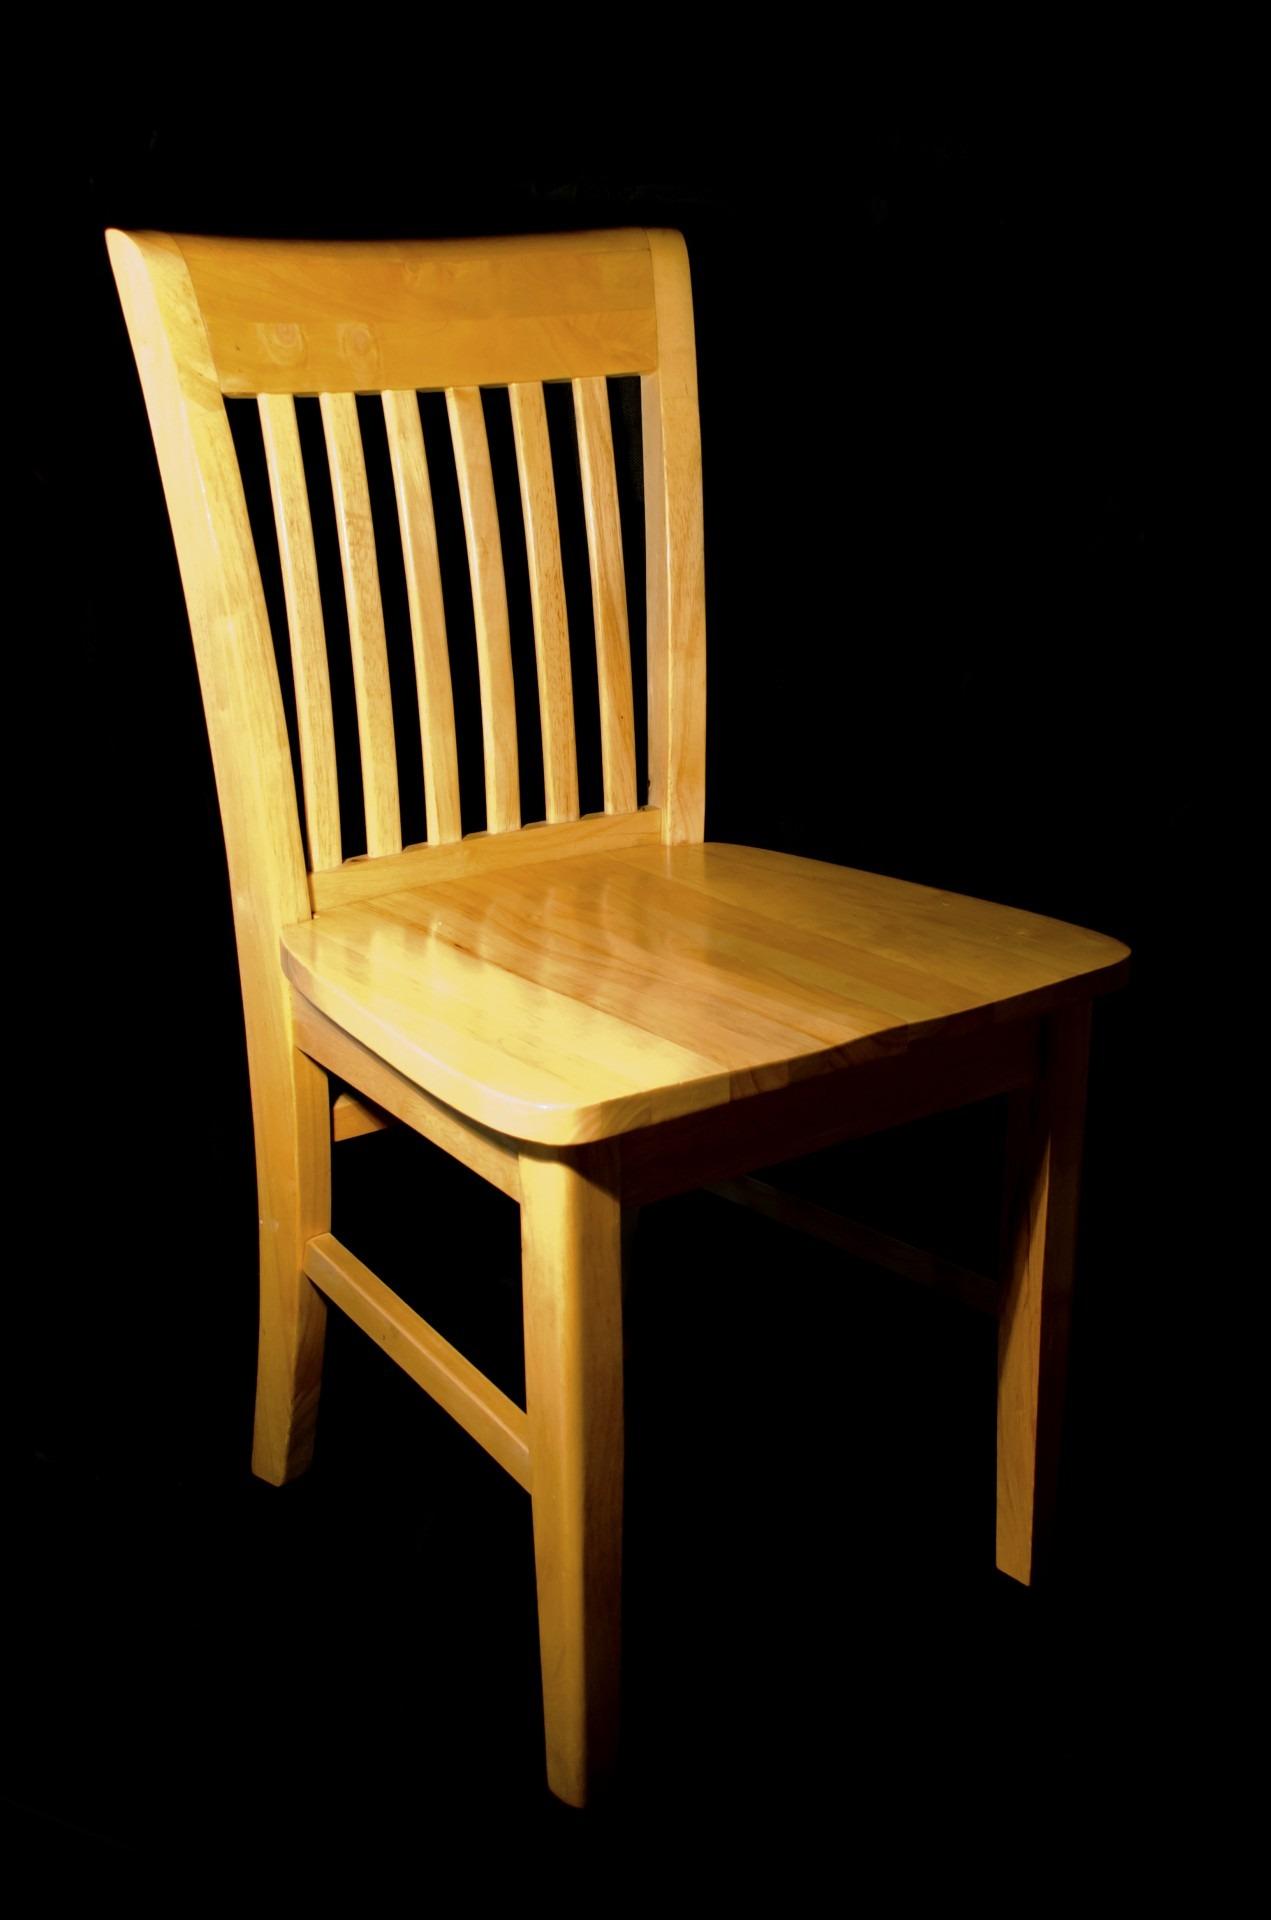 Fotos gratis : mesa, vendimia, silla, asiento, interior, casa ...